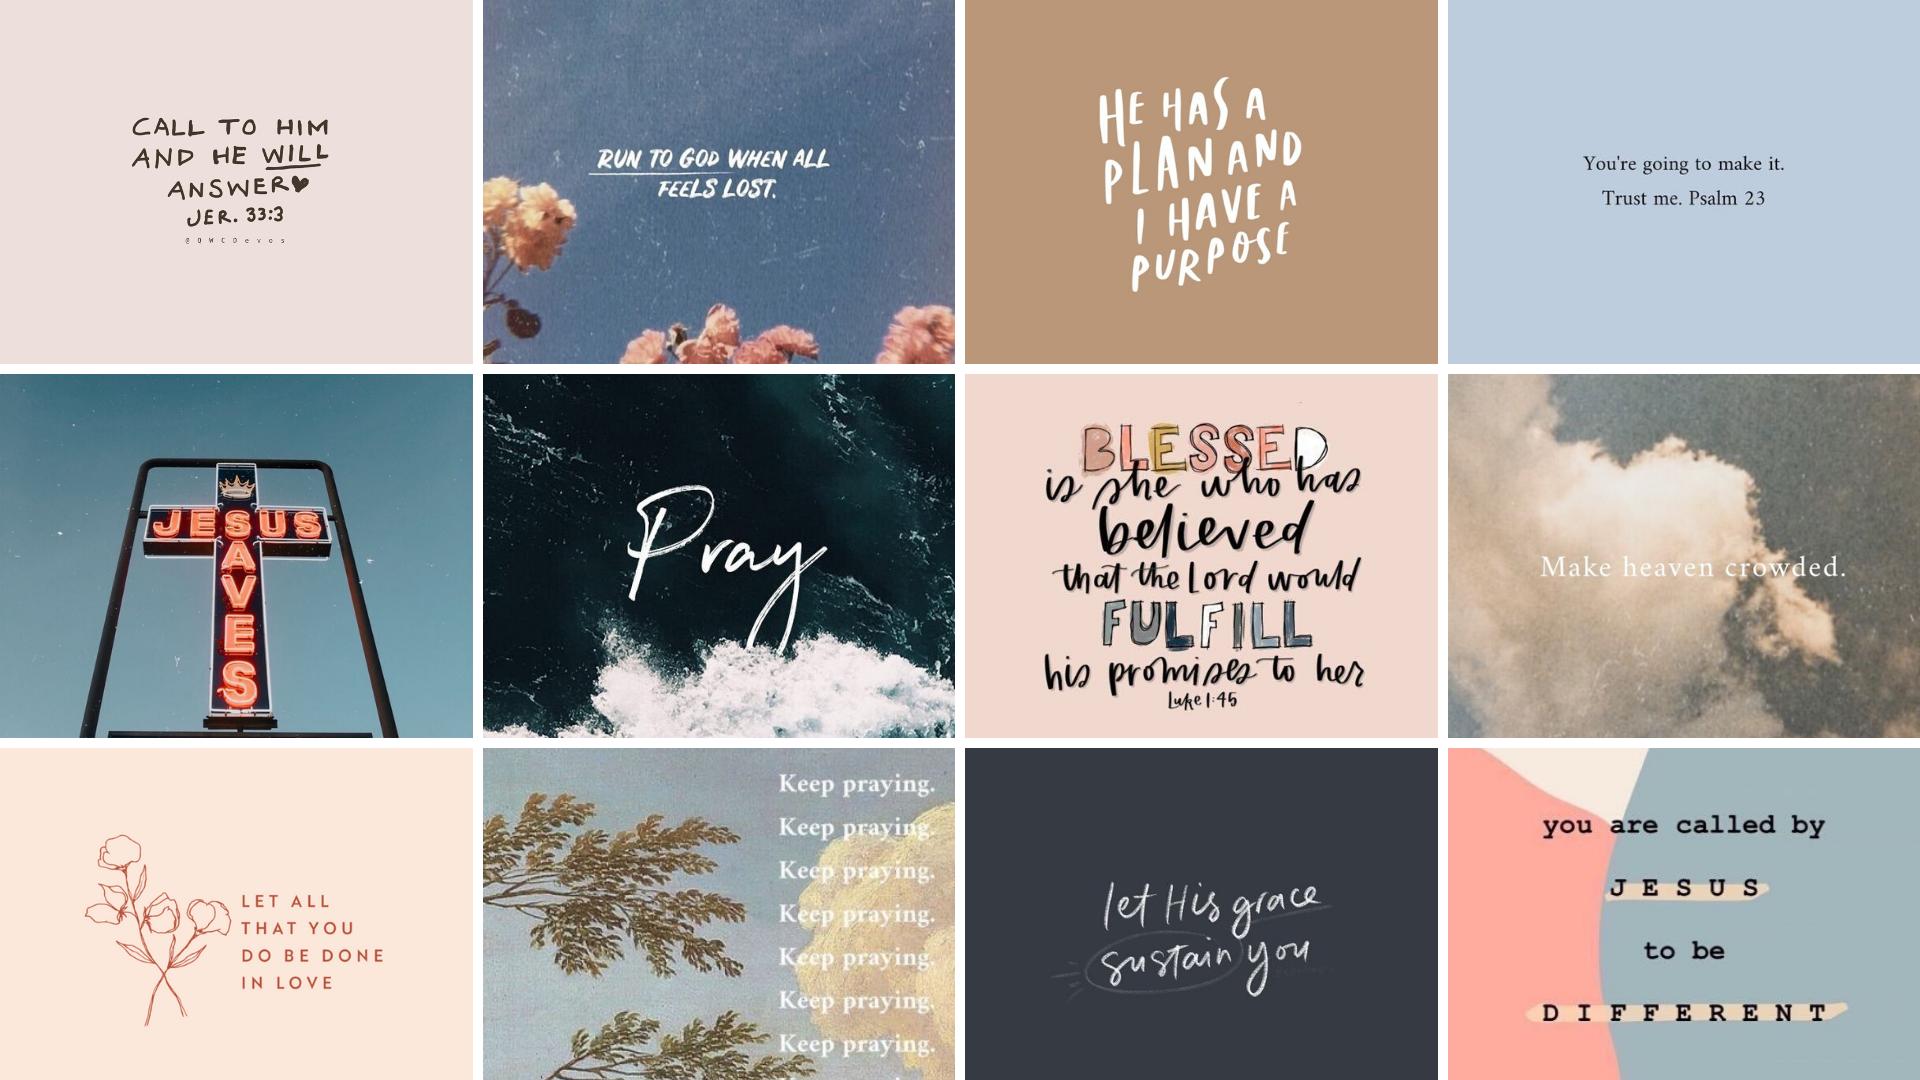 Christian Desktop Wallpaper In 2021 Bible Verse Desktop Wallpaper Jesus Wallpaper Inspirational Desktop Wallpaper